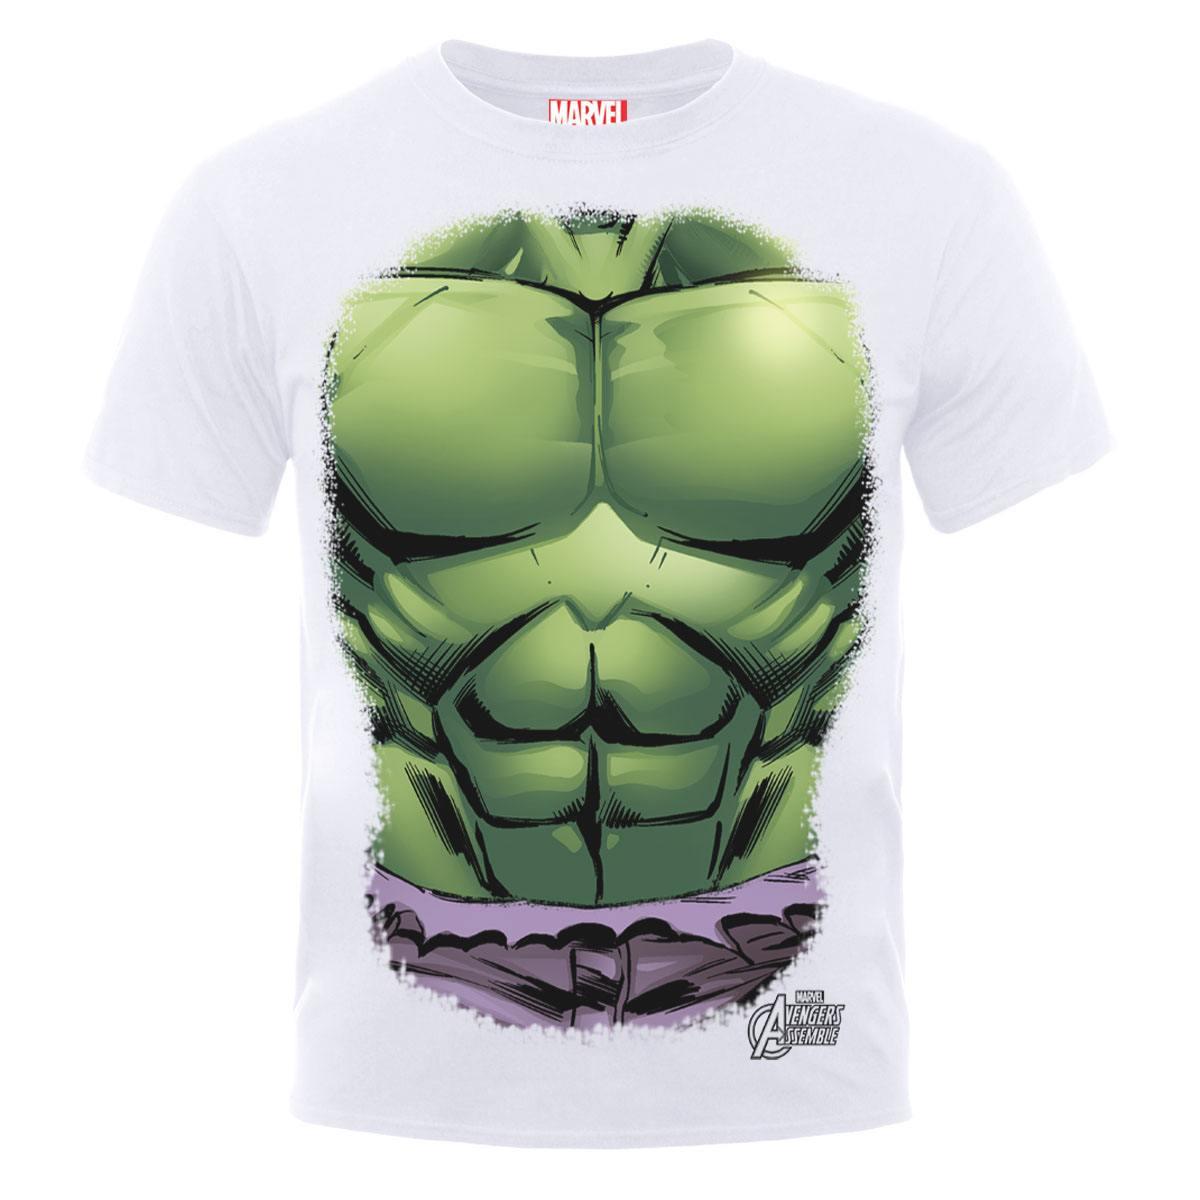 Marvel Comics T-Shirt Hulk Chest Size S